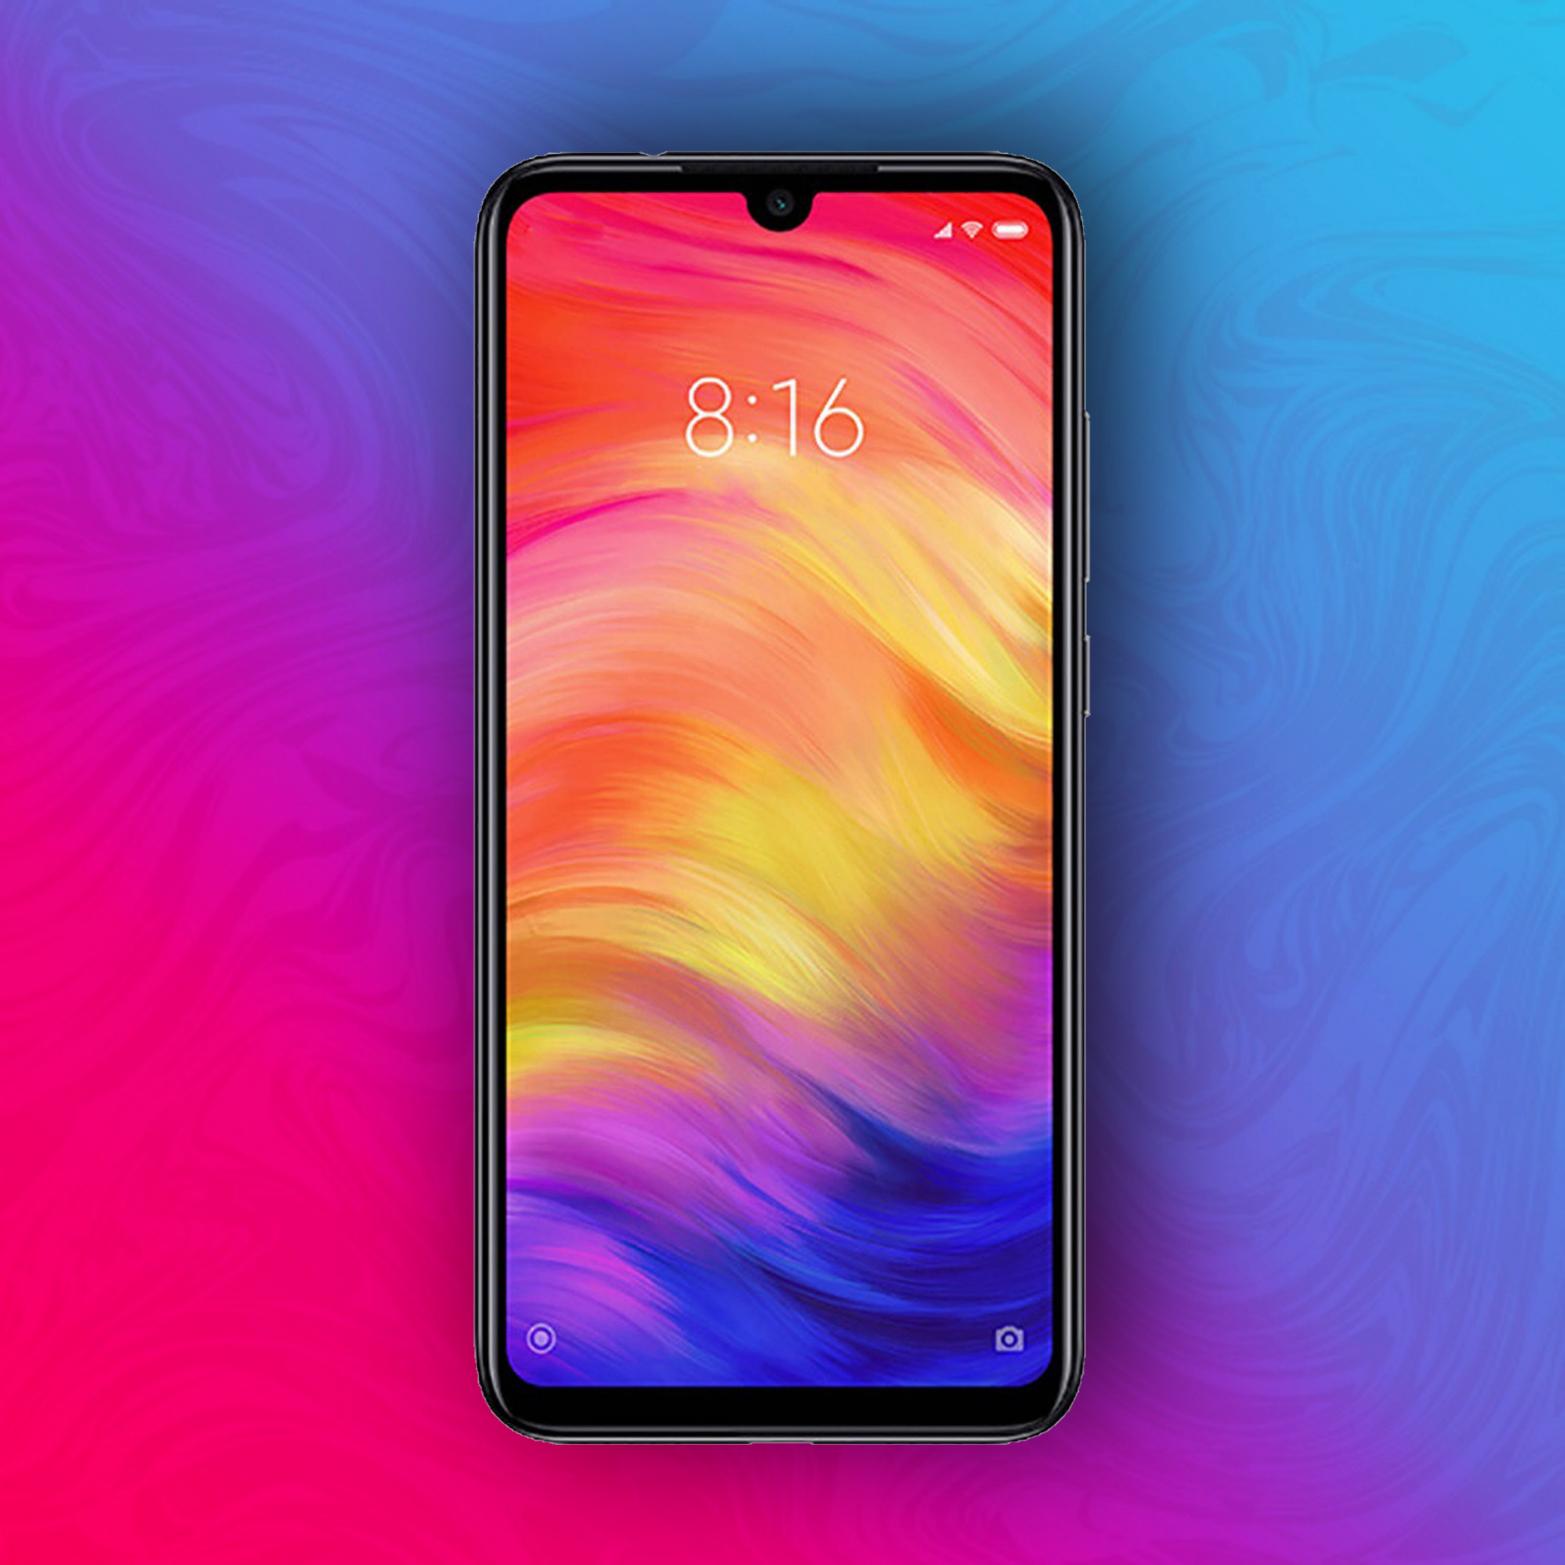 Xiaomi Redmi Note 7 128/4GB - Snapdragon 660 - 48MP/5MP Kamera - 4000mAh Akku | Global Version